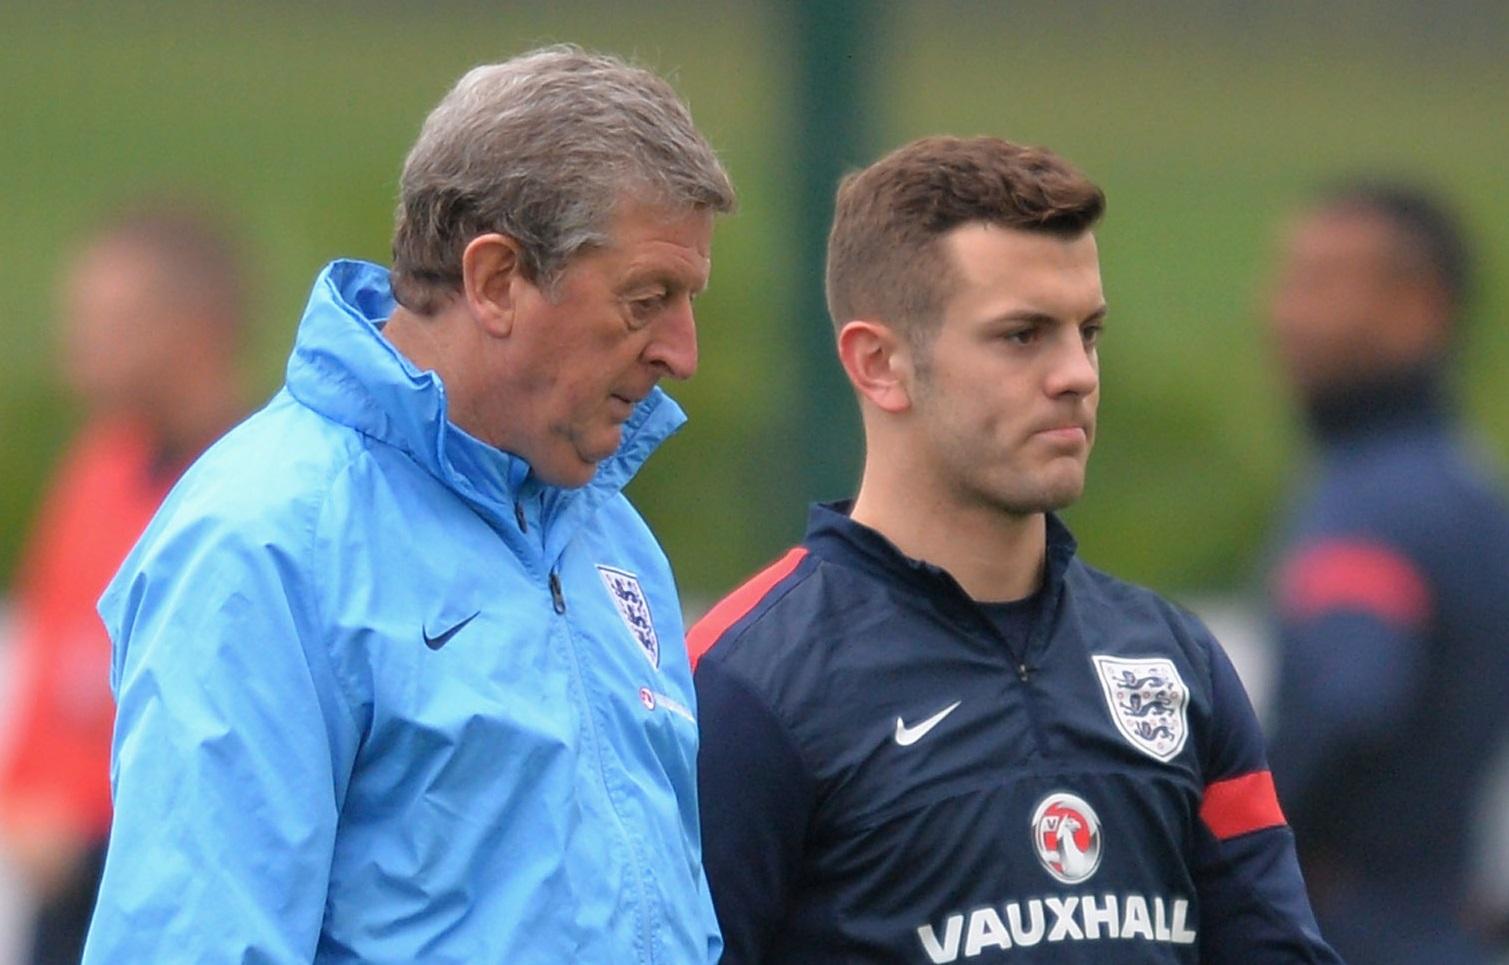 Roy Hodgson and Jack Wilshere